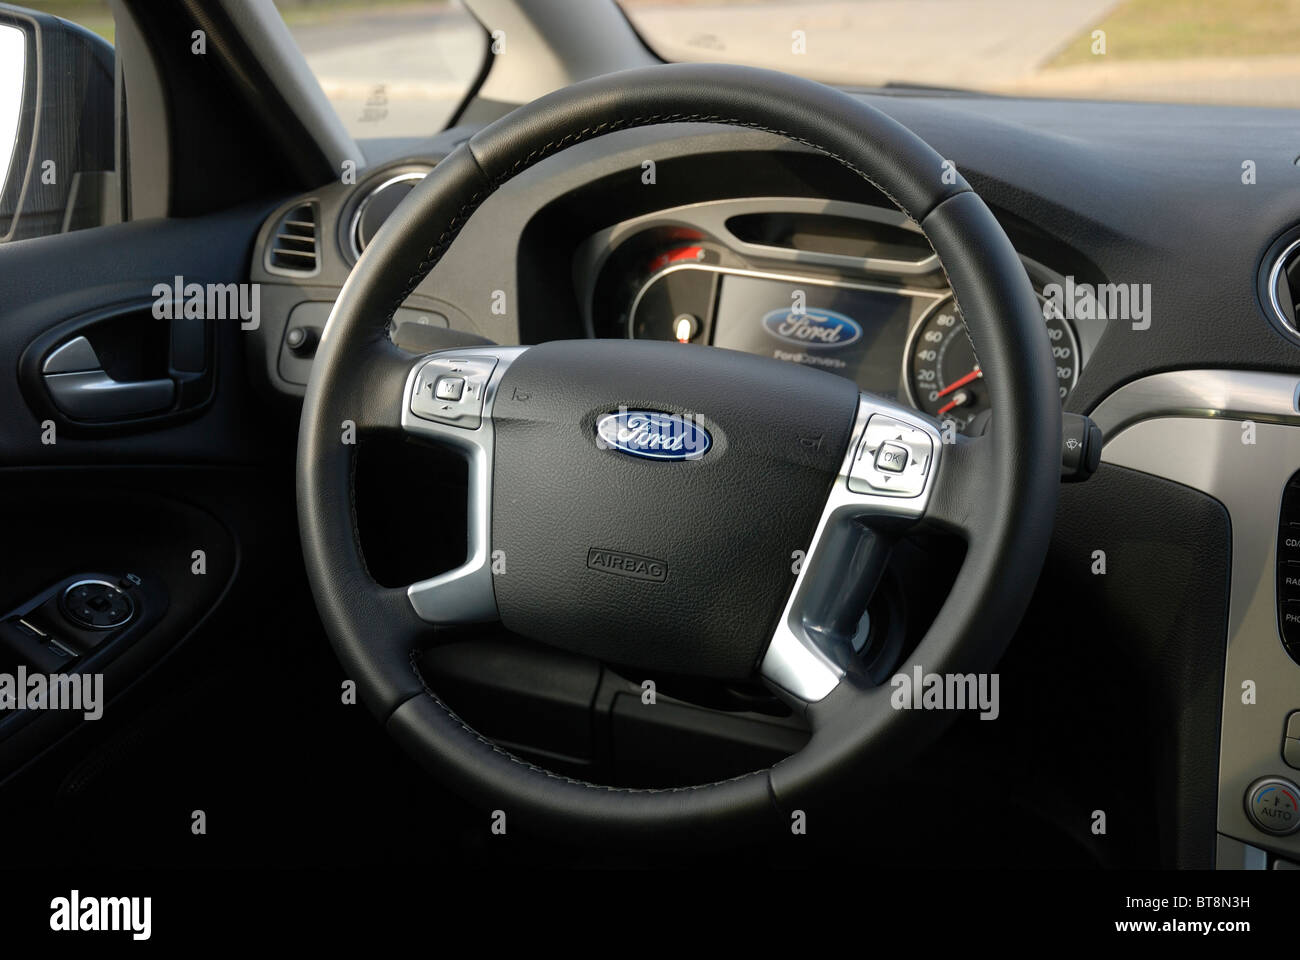 Ford S-MAX 2.0 TDCI - 2006 - black metallic - five doors (5D) - Popular German MPV (minivan) - interior, steering - Stock Image